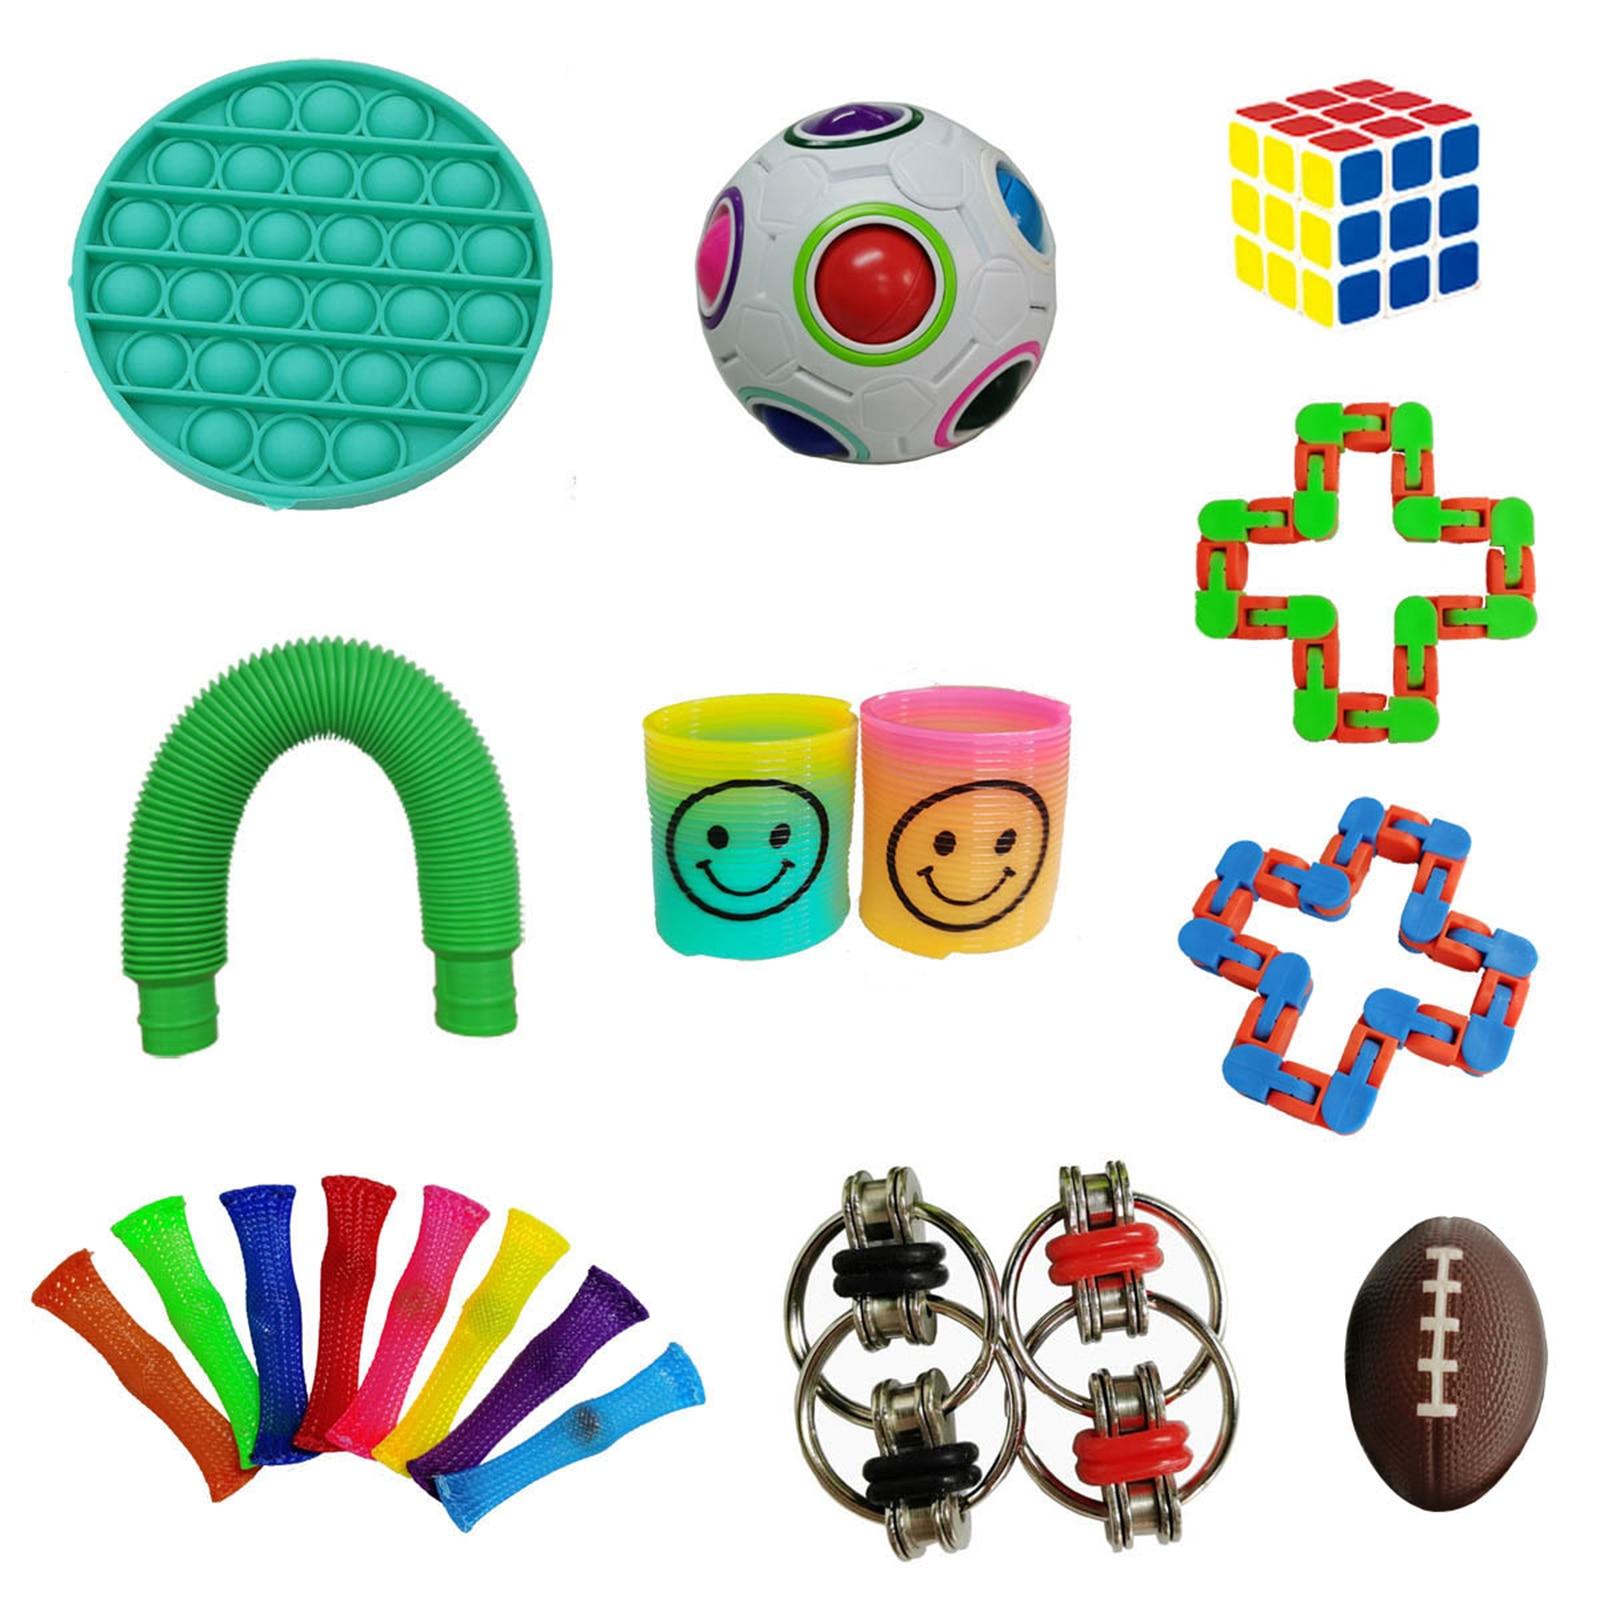 Toy-Kit Sensory-Toy-Set Relief-Toys Fidget-Hand-Toys Autism Stress Decompression Pop img3